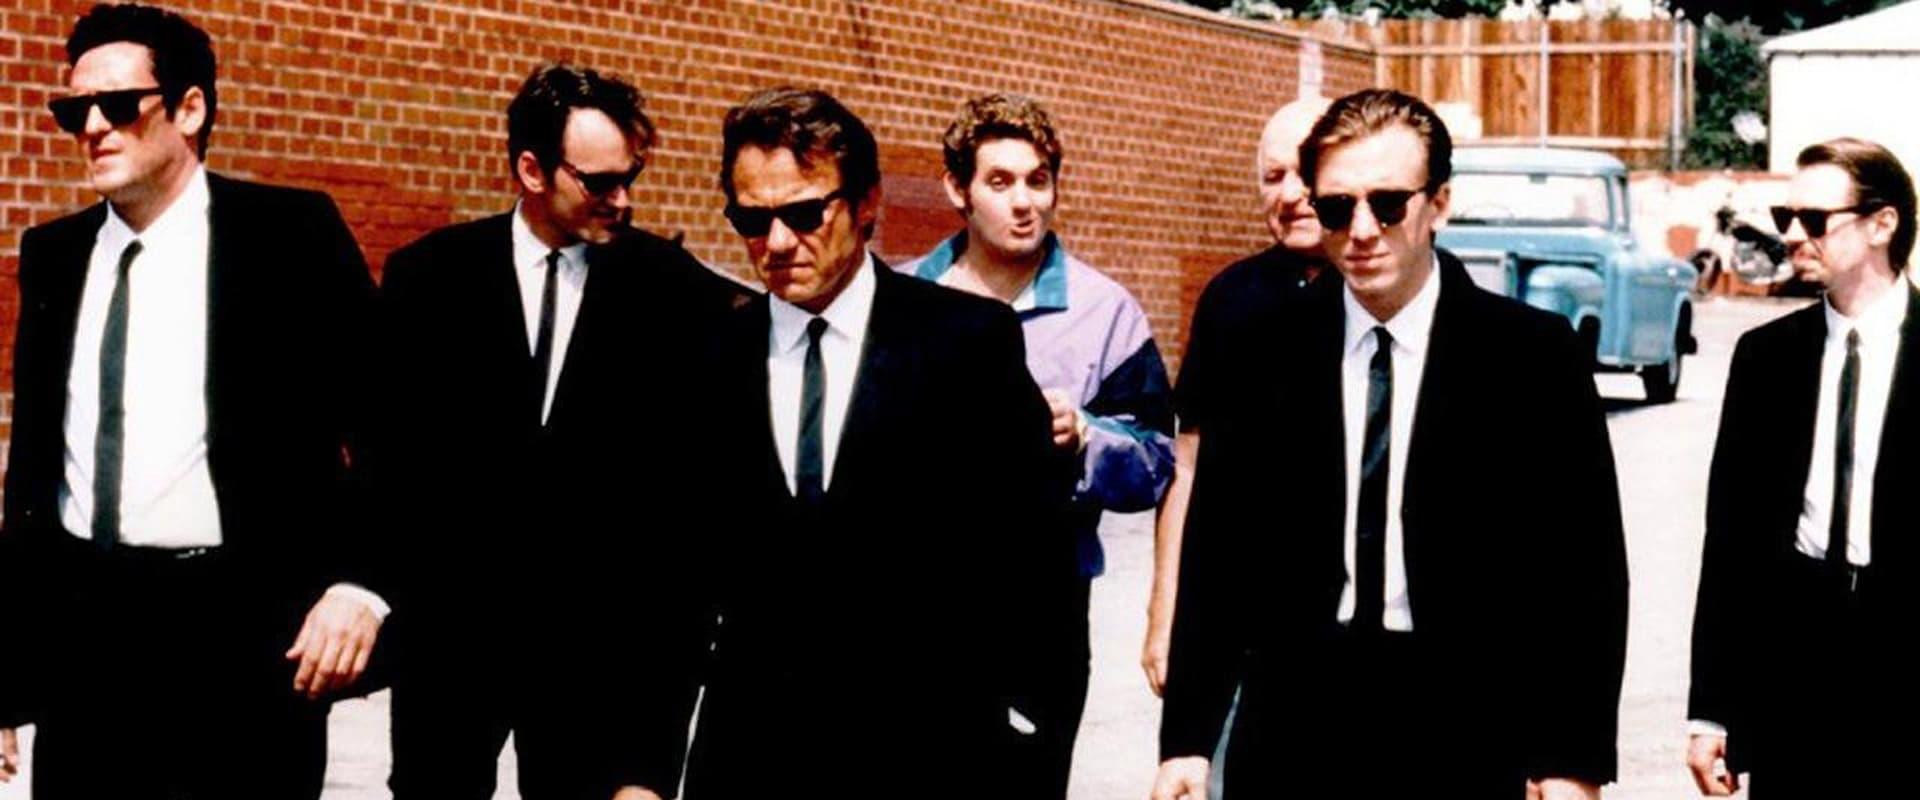 Reservoir Dogs 123Movies Watch Full Movie Online Stream